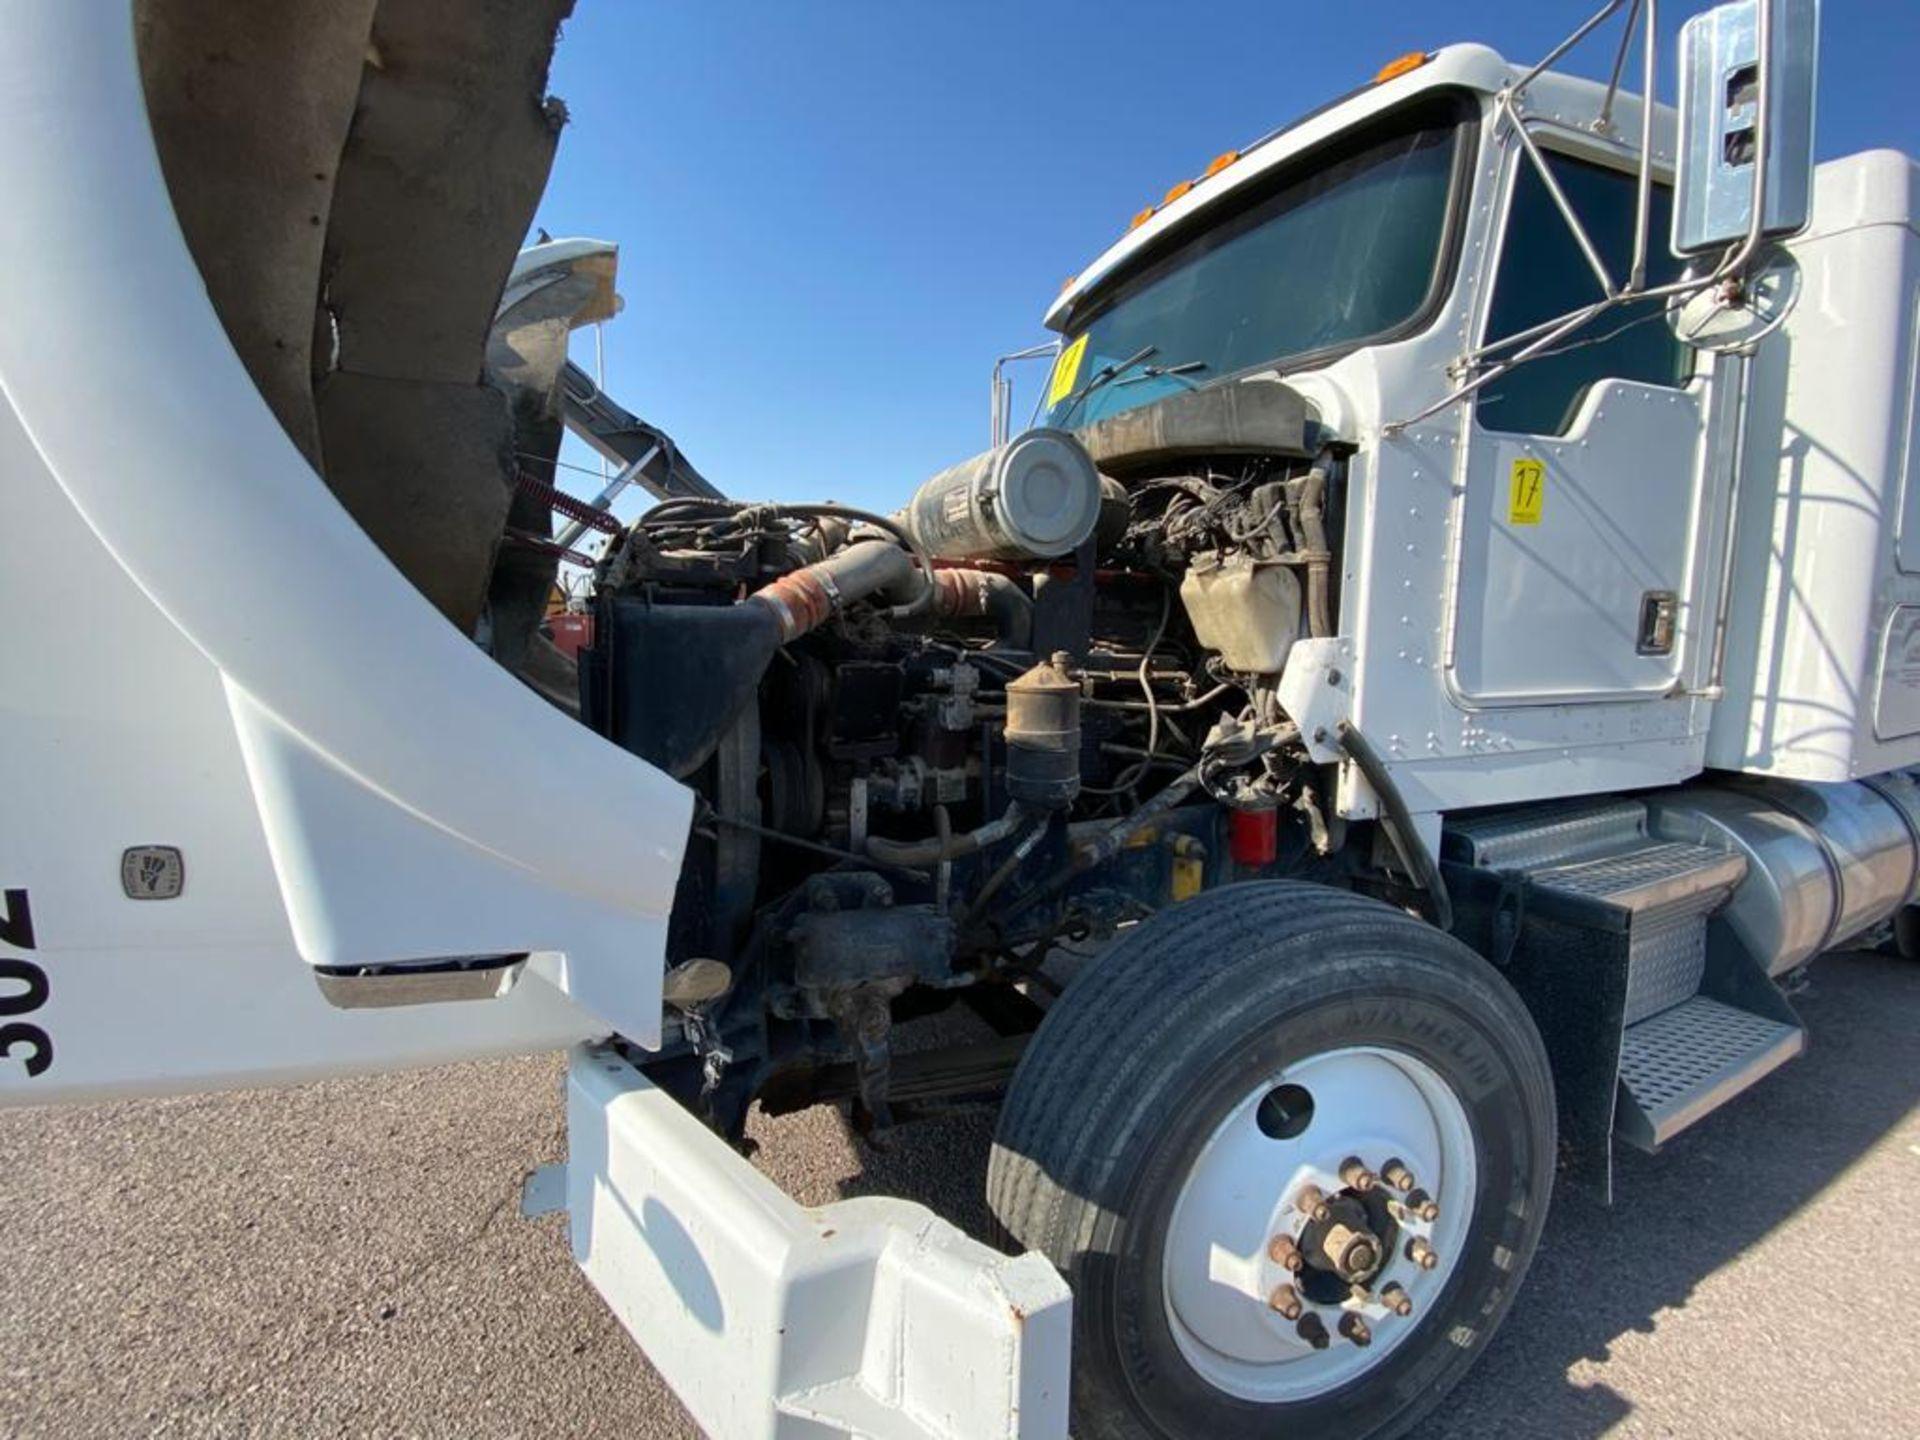 1998 Kenworth Sleeper Truck Tractor, standard transmission of 18 speeds - Image 42 of 55